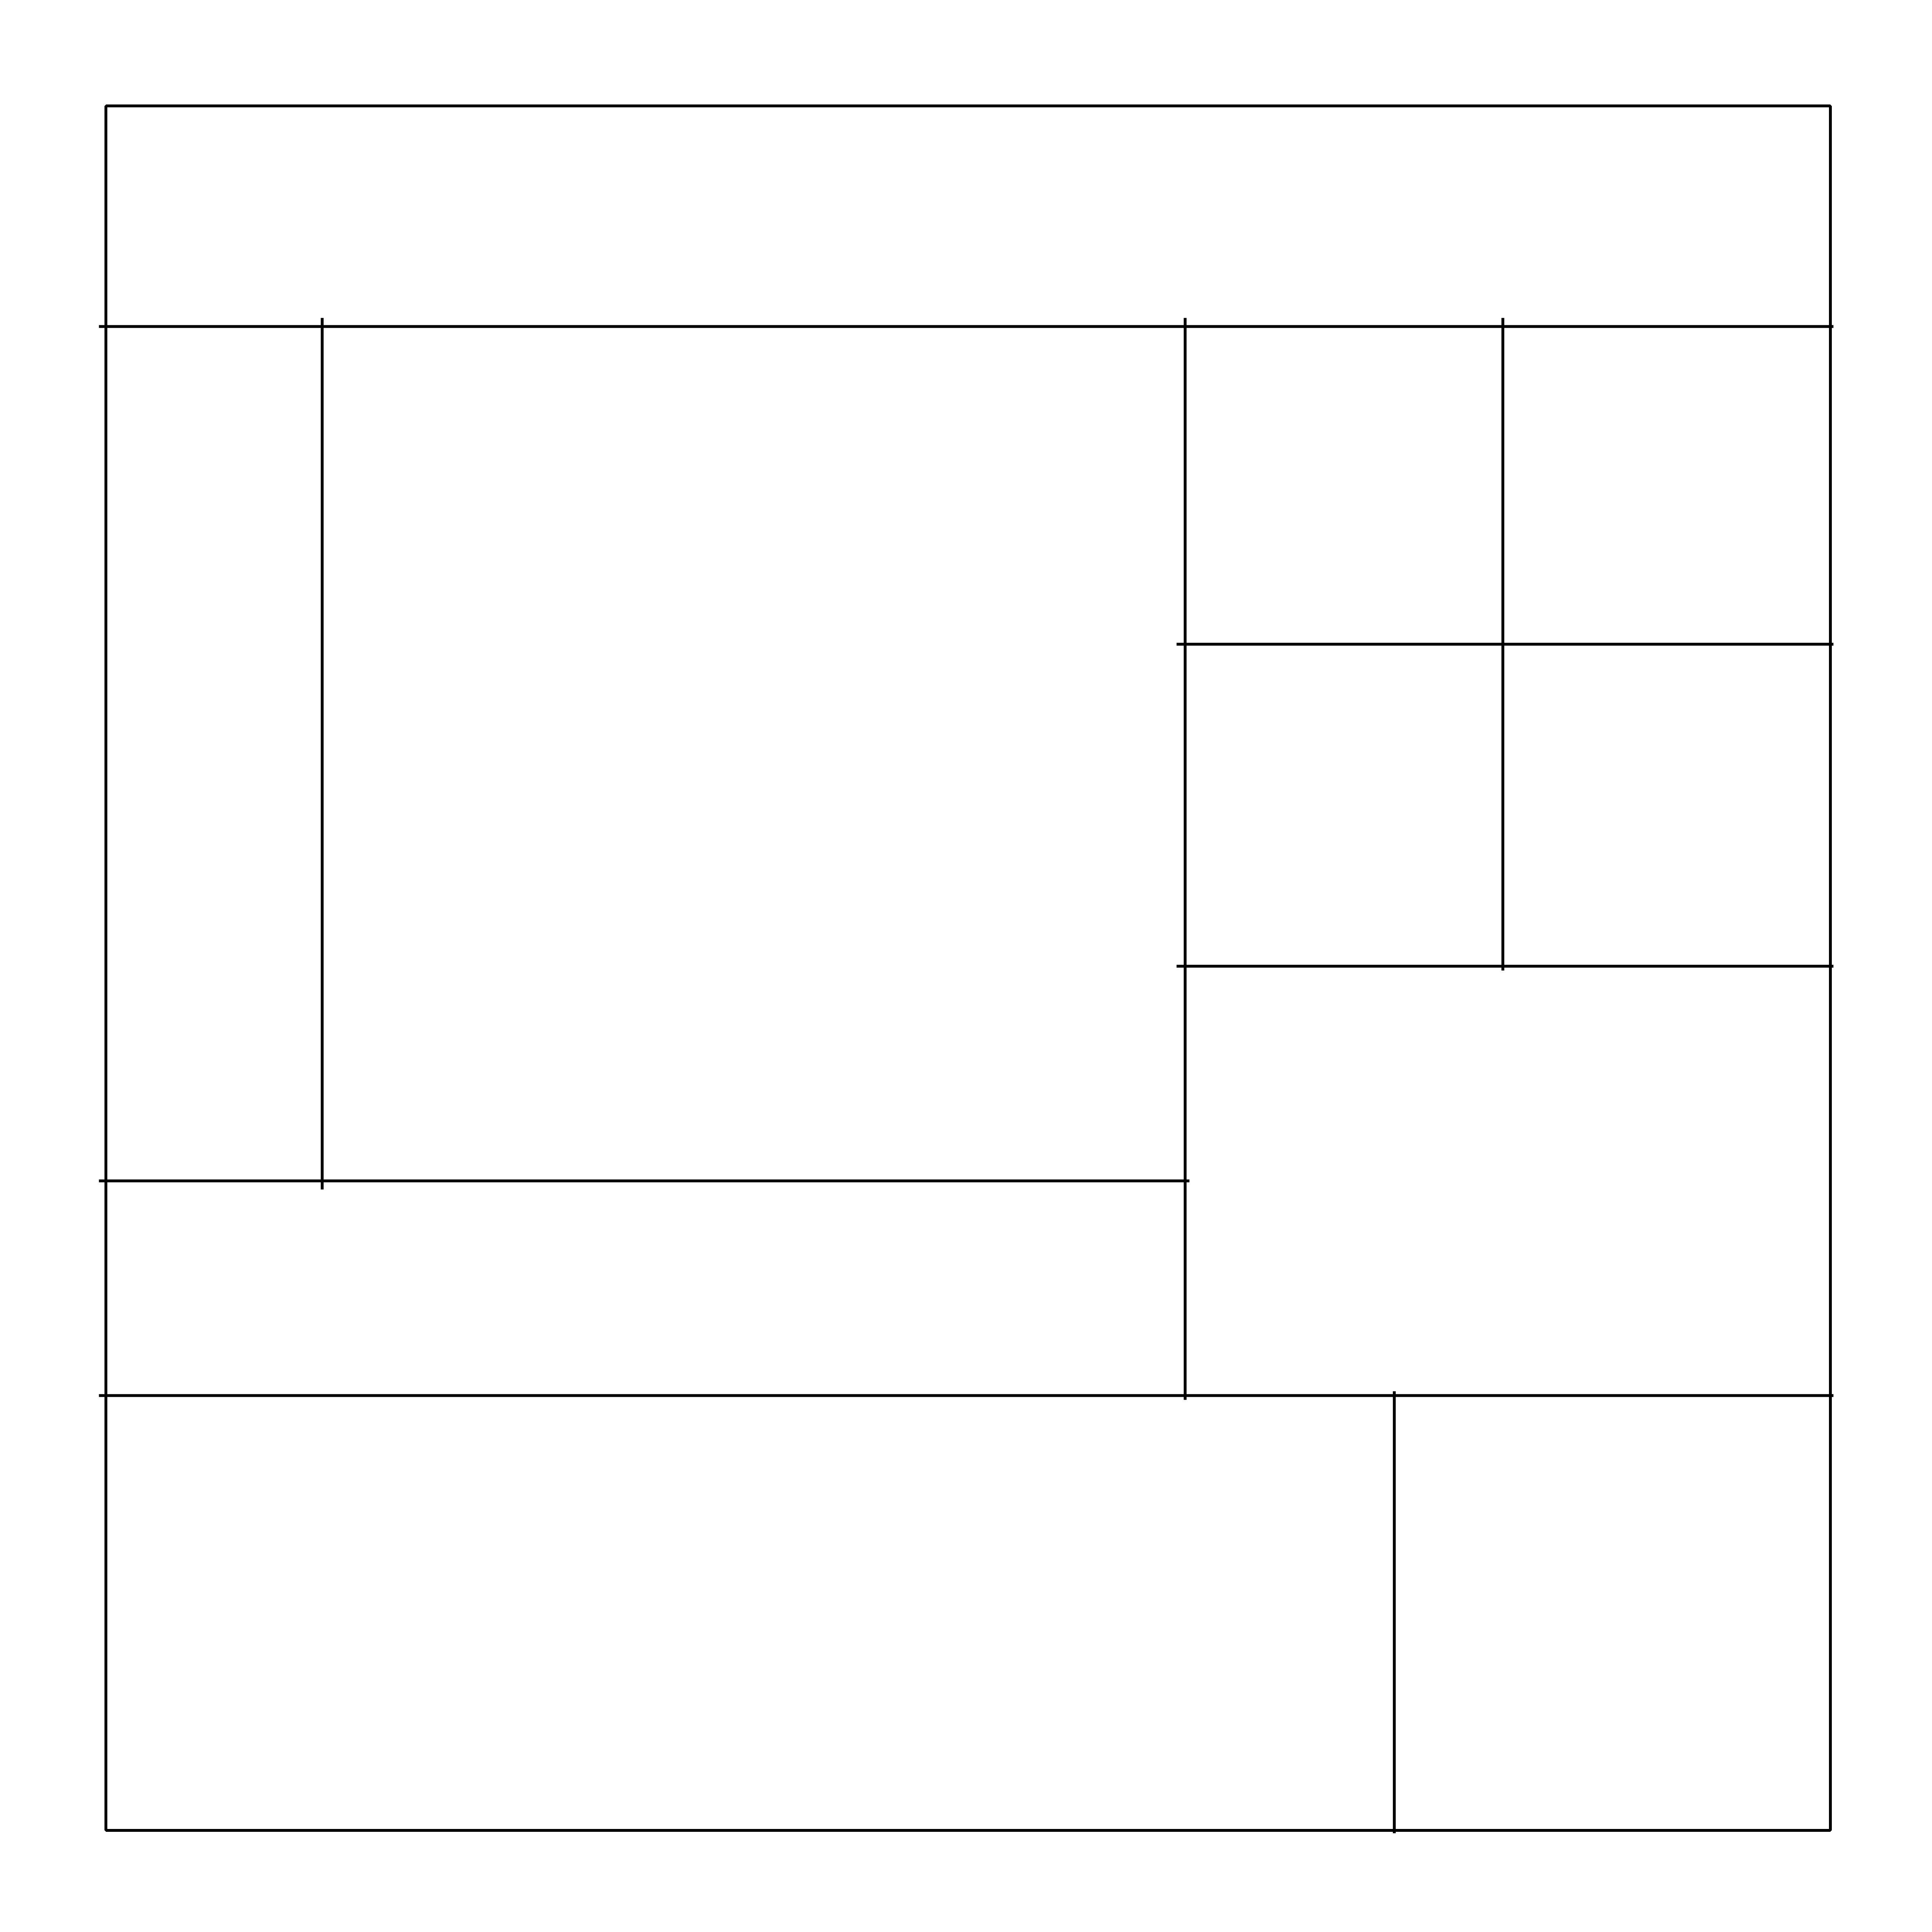 turning twenty quilt pattern | turning-twenty-again | Amazing ... : free turning twenty quilt pattern - Adamdwight.com